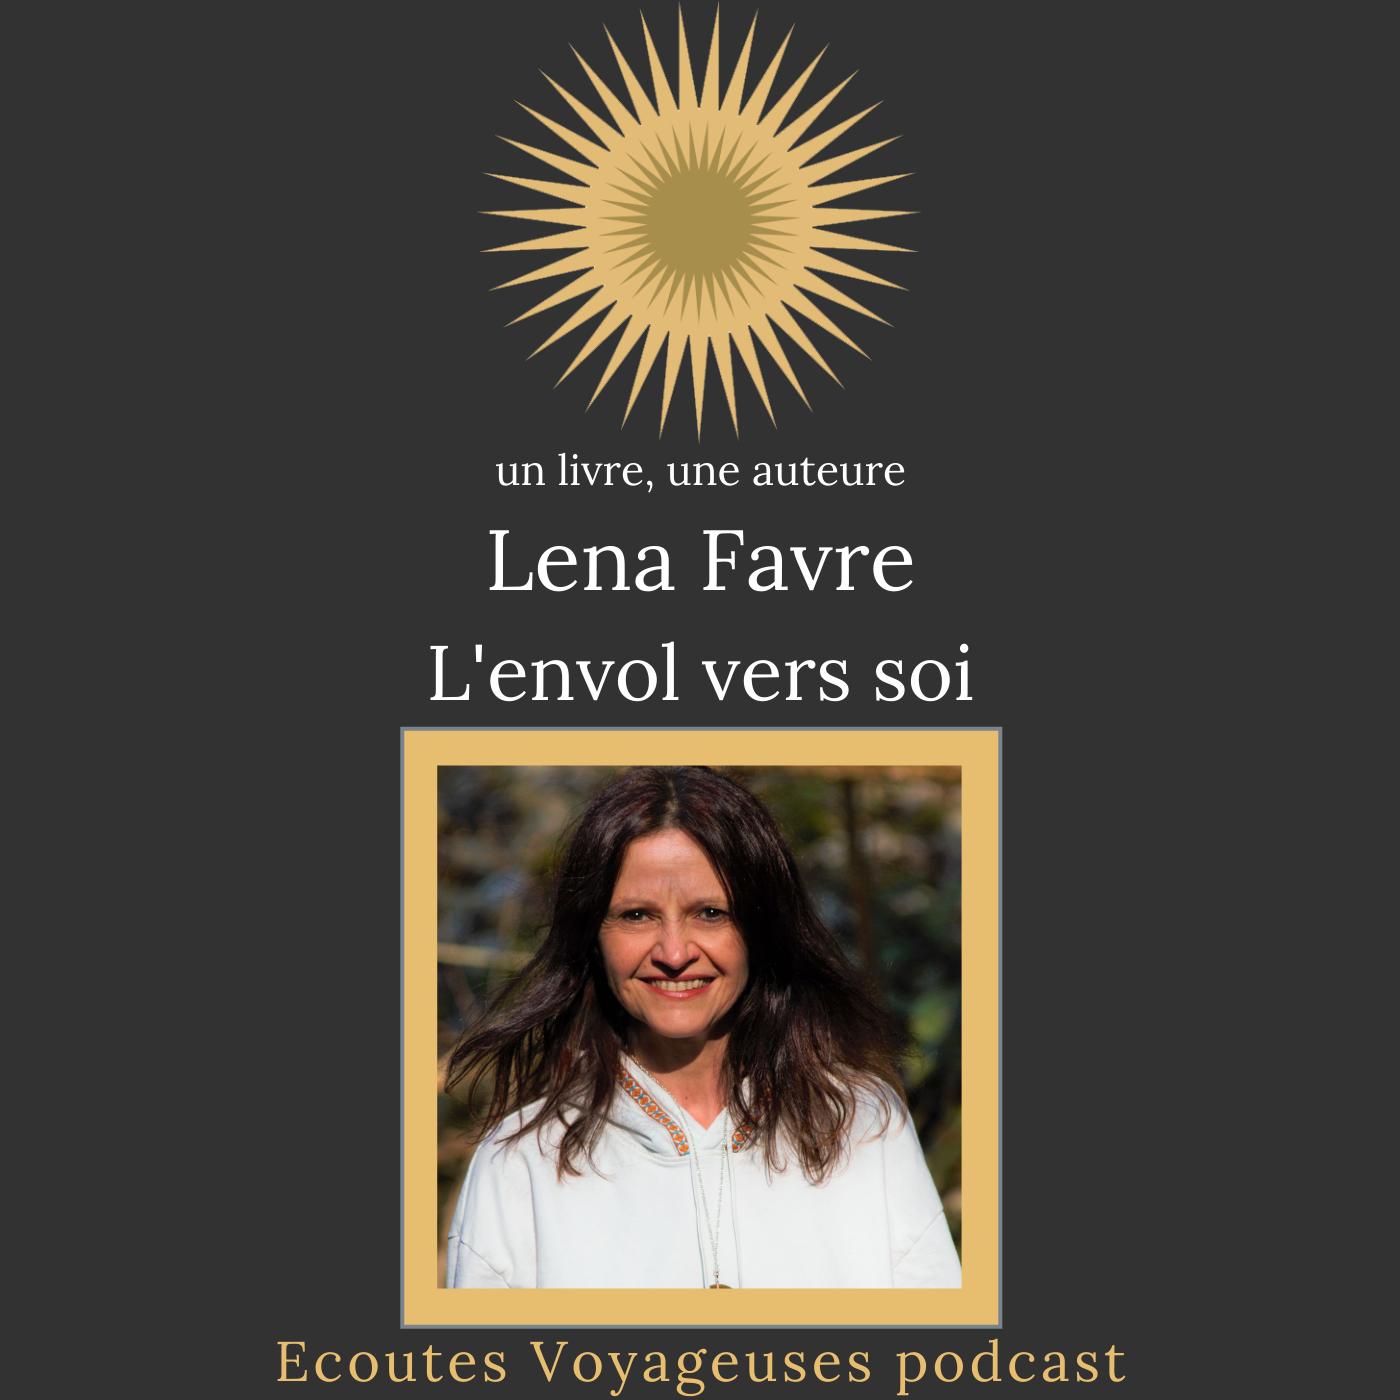 Lena Favre, l'envol vers soi- voyage quantique